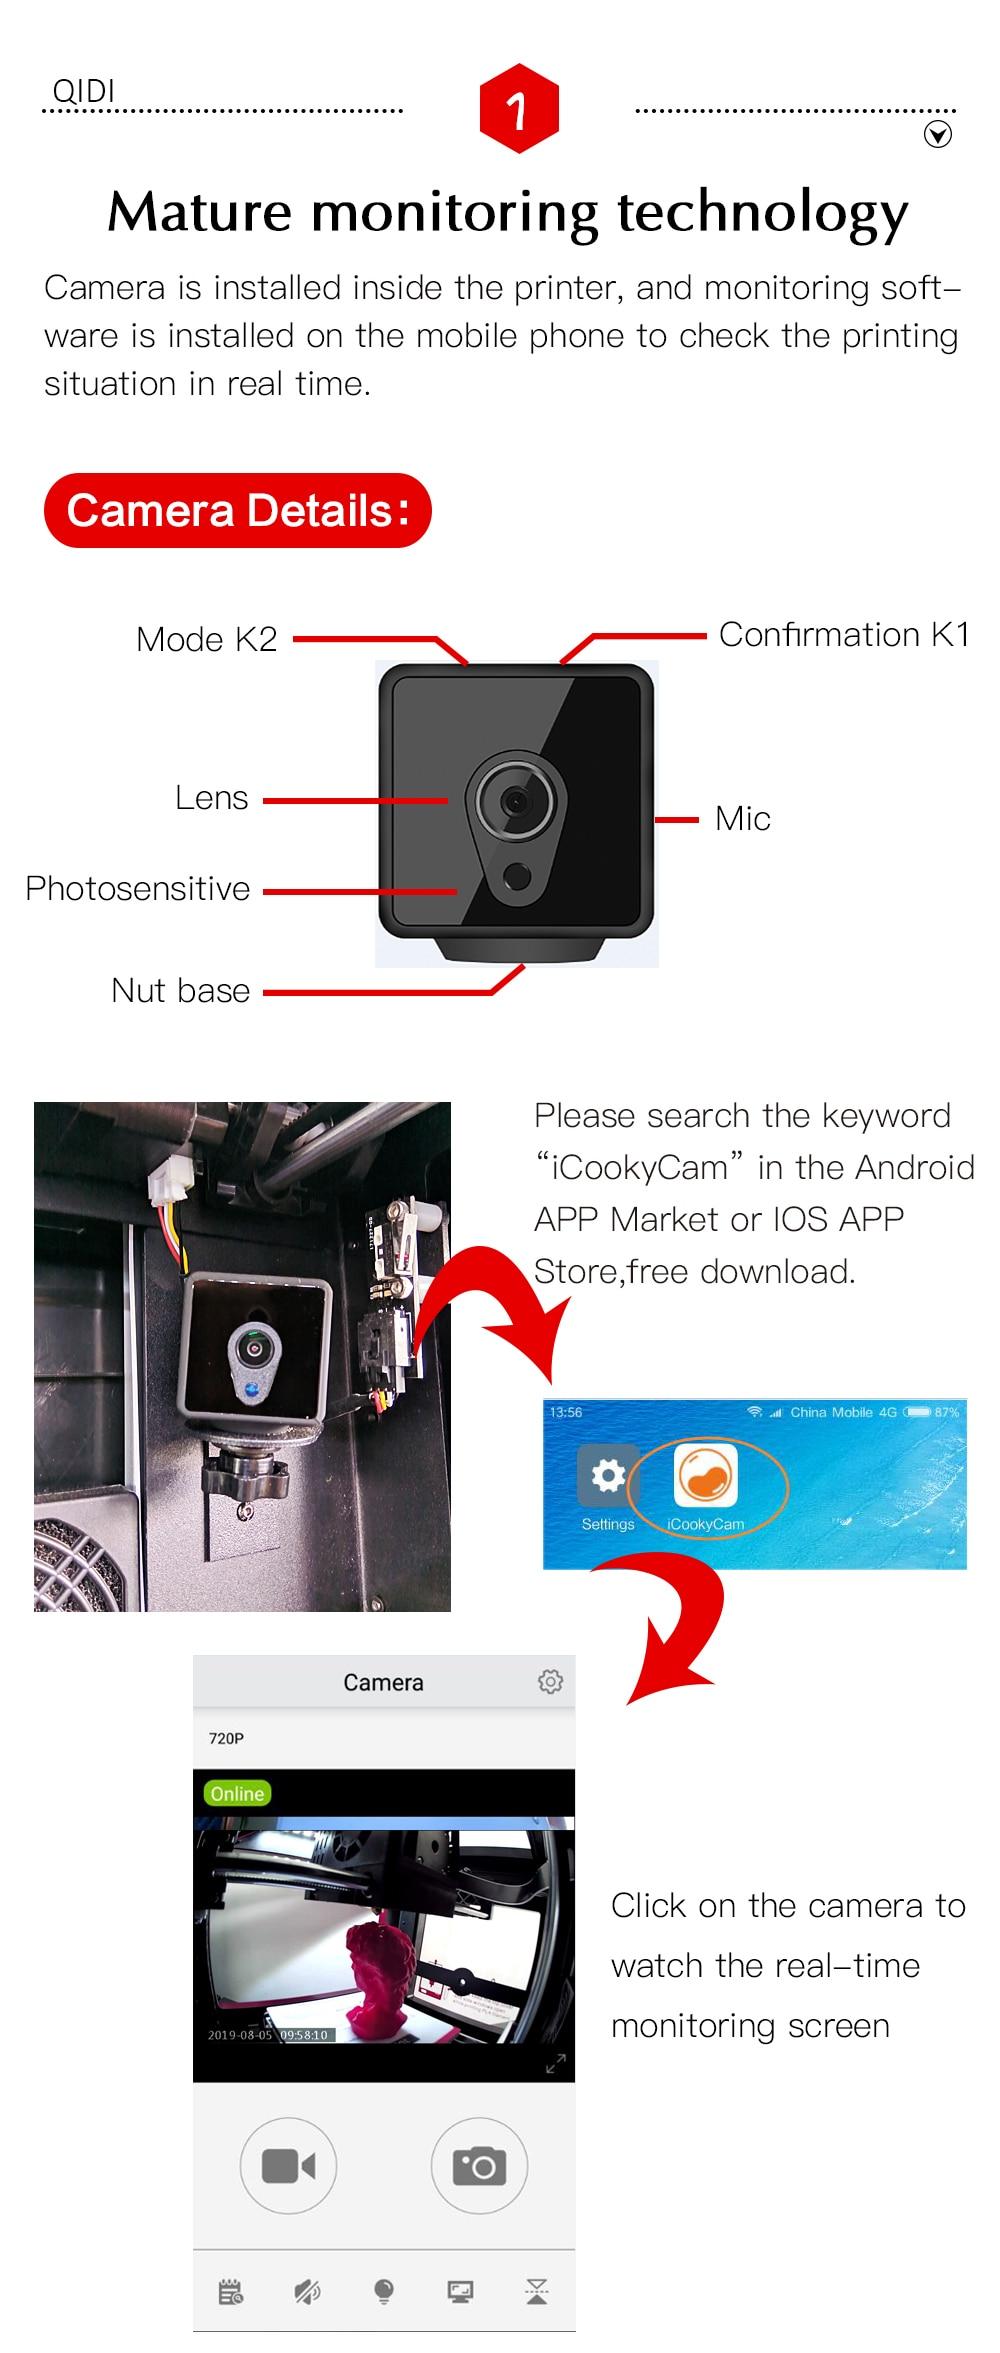 QIDI TECH X-Maker 3D Printer with Camera Wifi Touch Screen Single Nozzle Printing 9